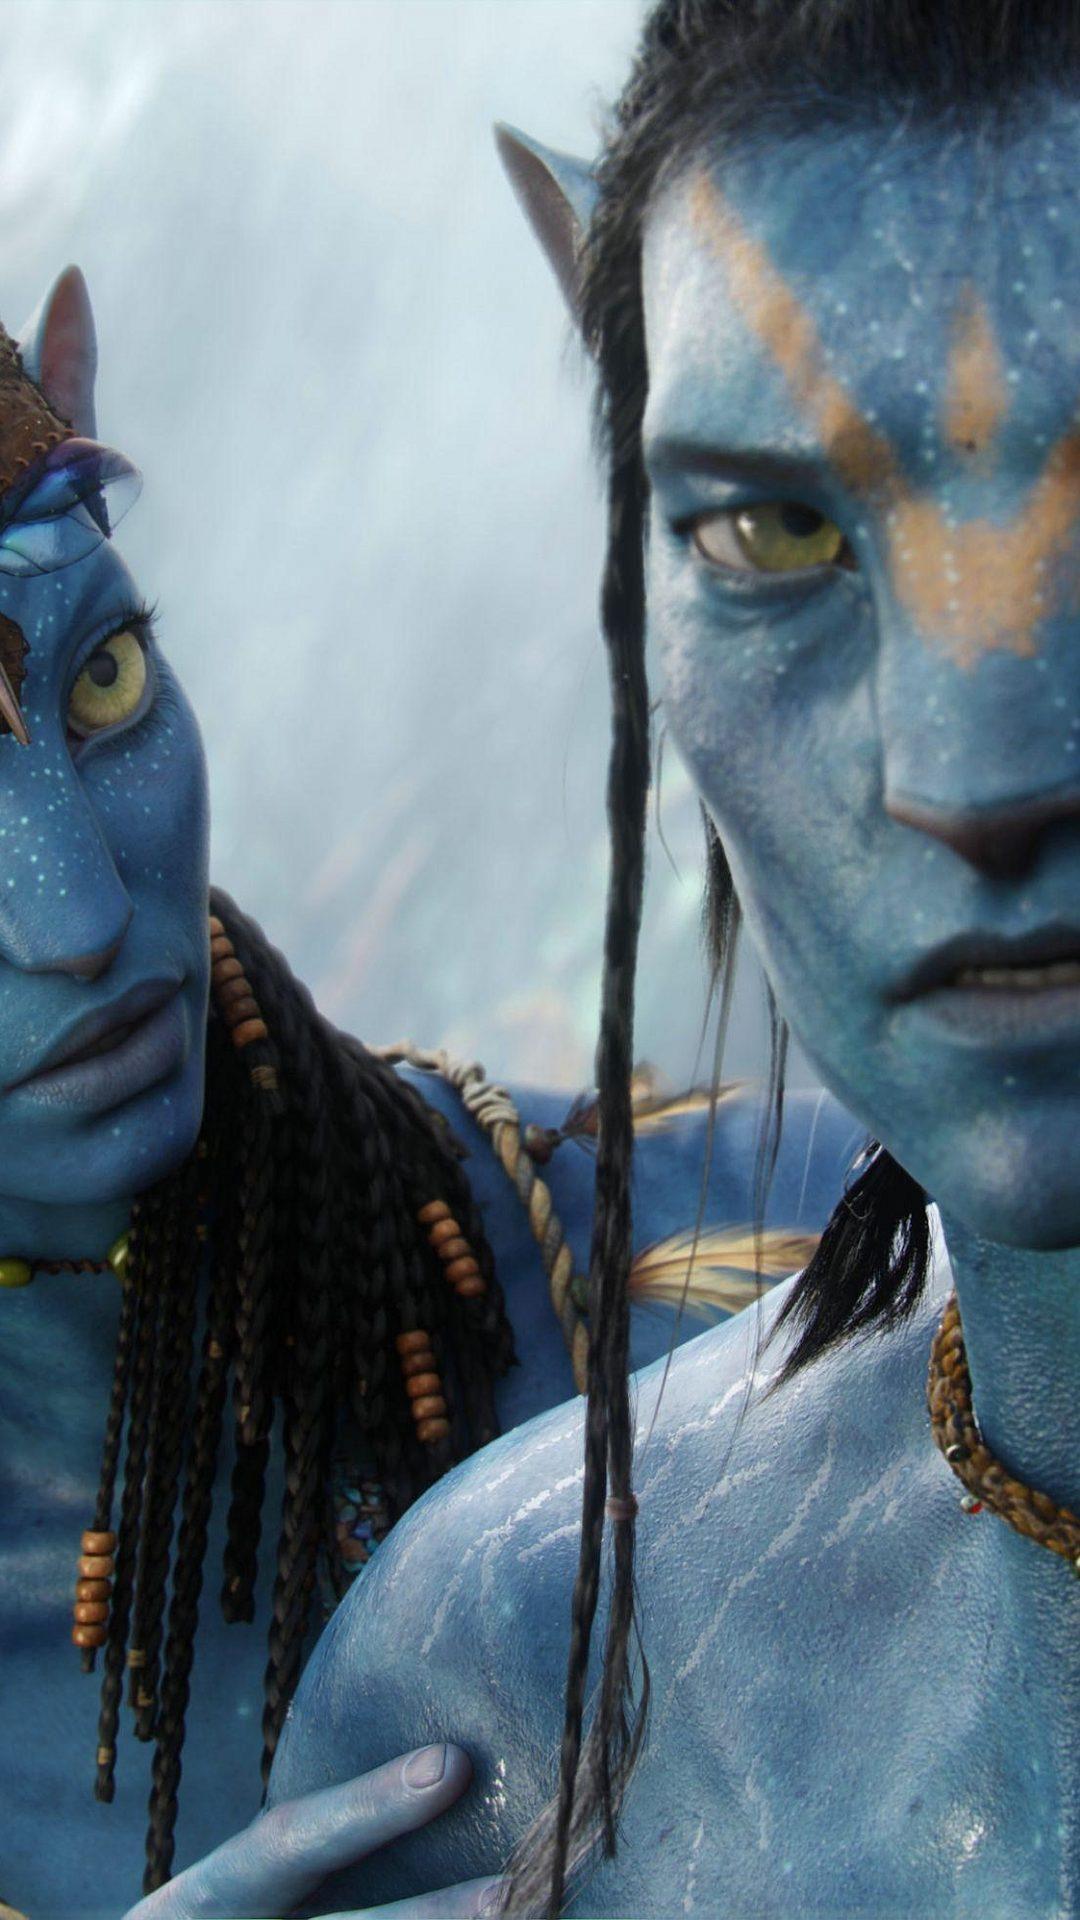 Avatar 2009 Neytiri And Jake Sully Hd Wallpaper